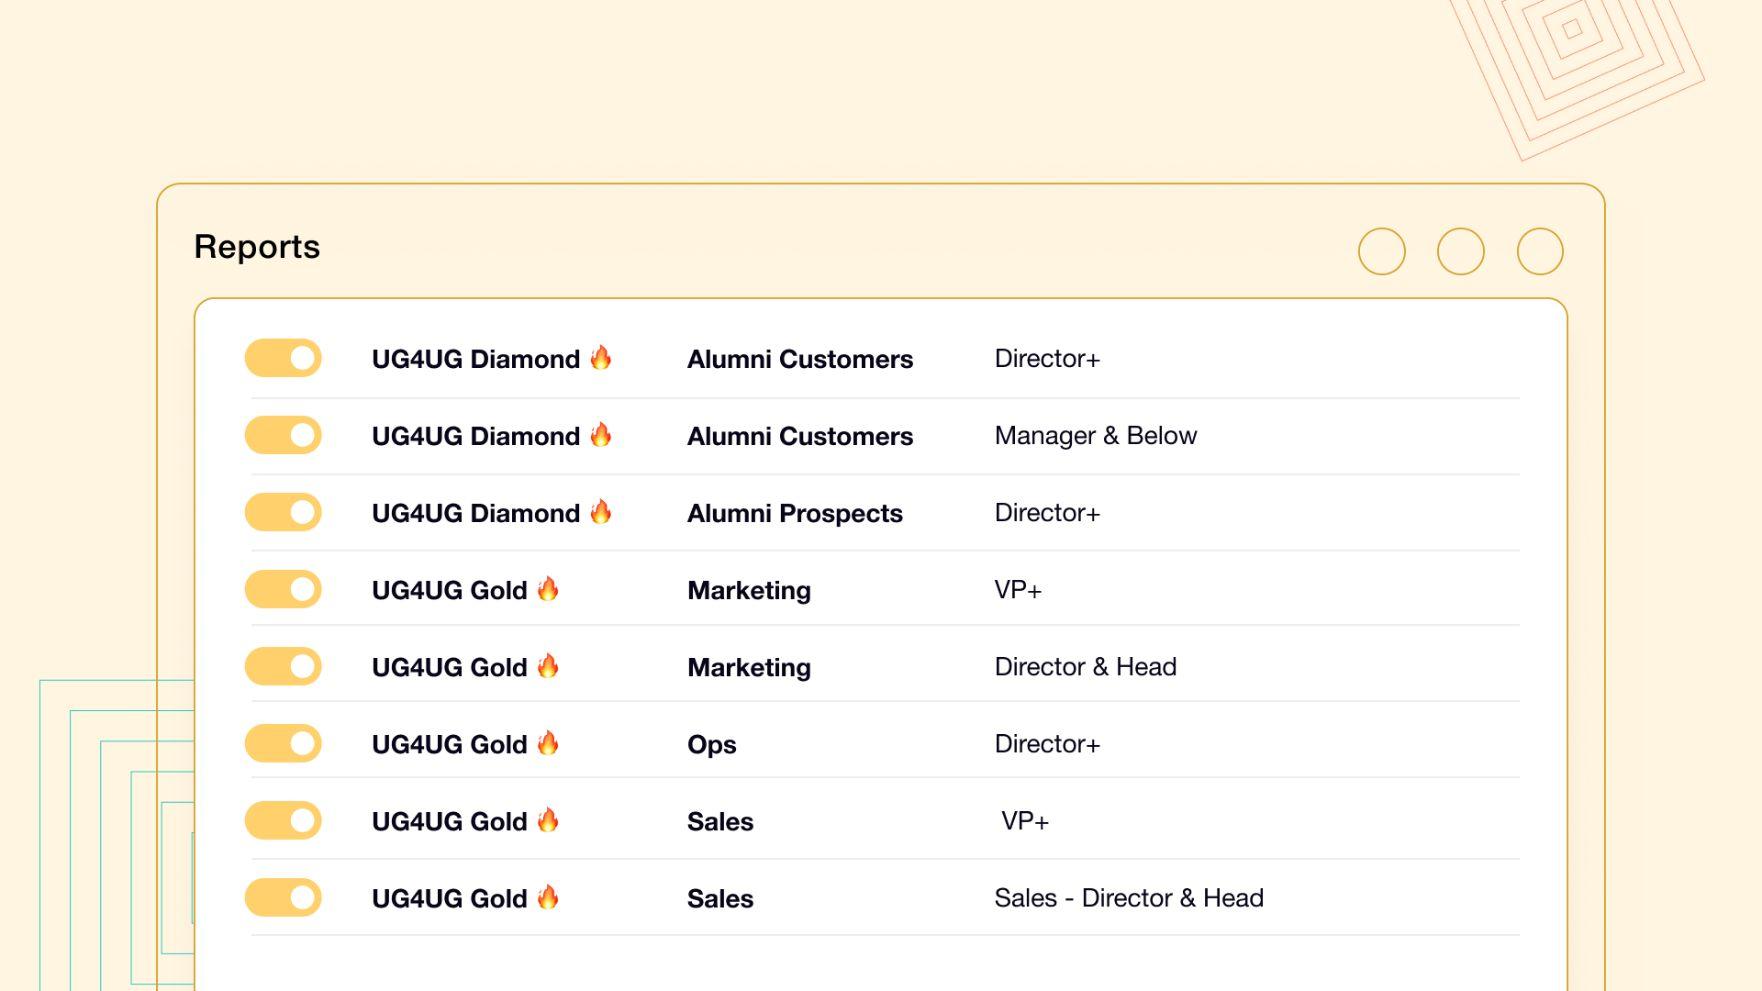 UserGems track job changes reports